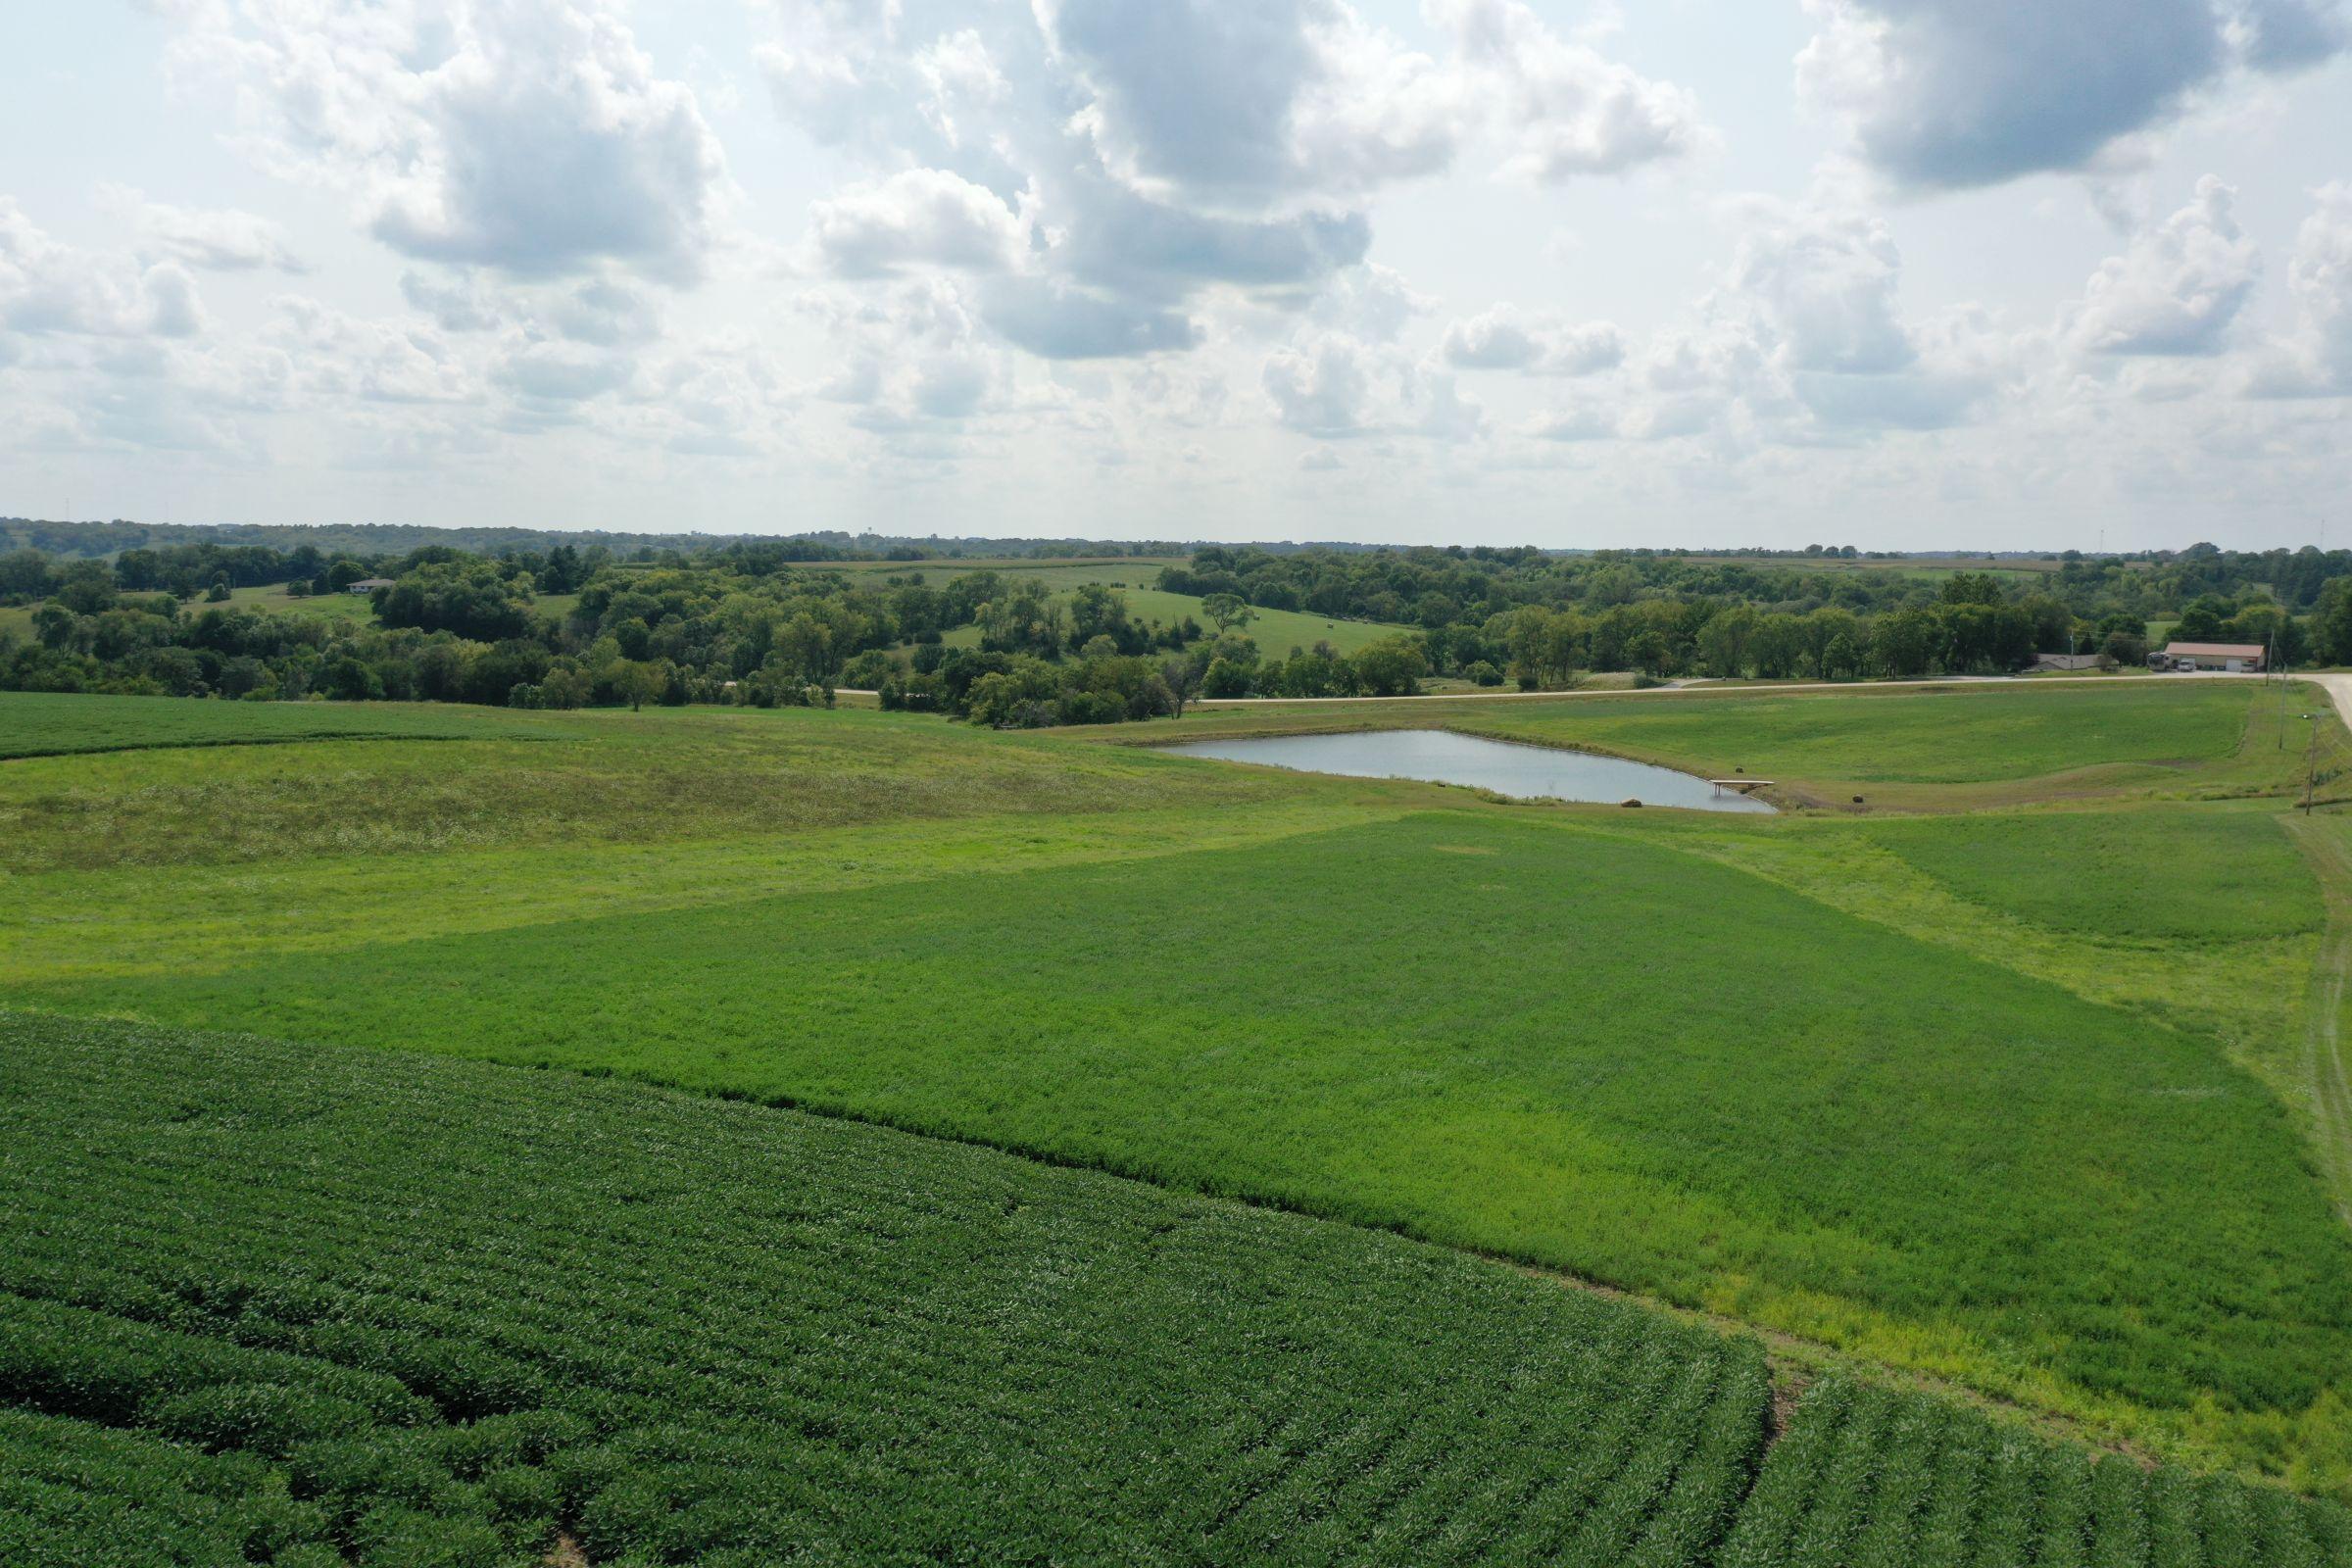 land-warren-county-iowa-8-acres-listing-number-15695-3-2021-09-01-185951.JPG